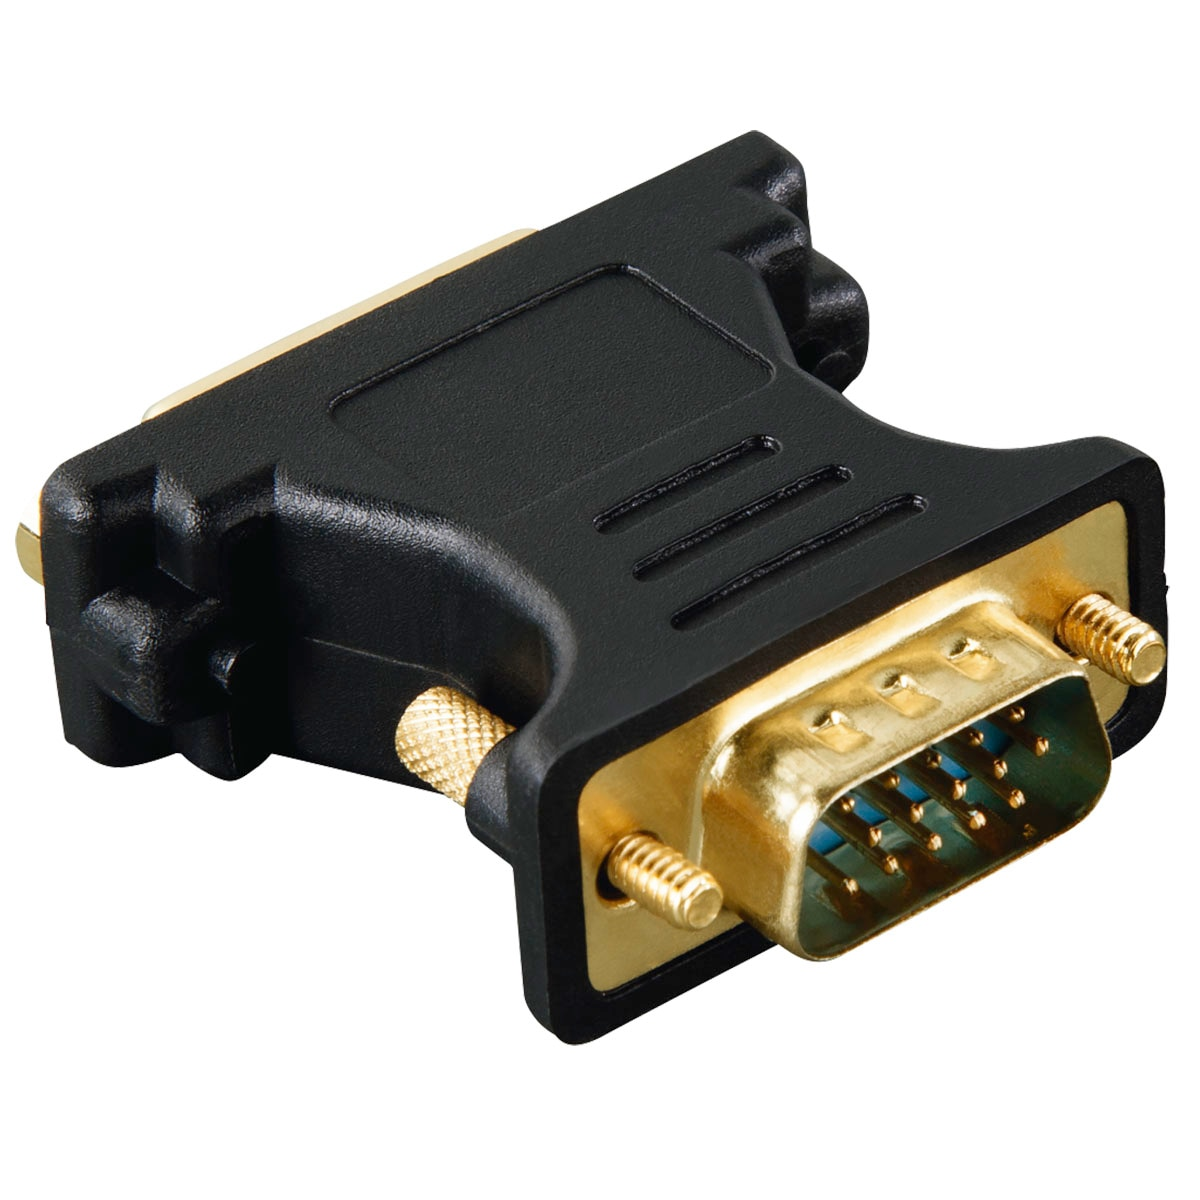 Fotografie Adaptor Hama 15-pin VGA-DVI, analog